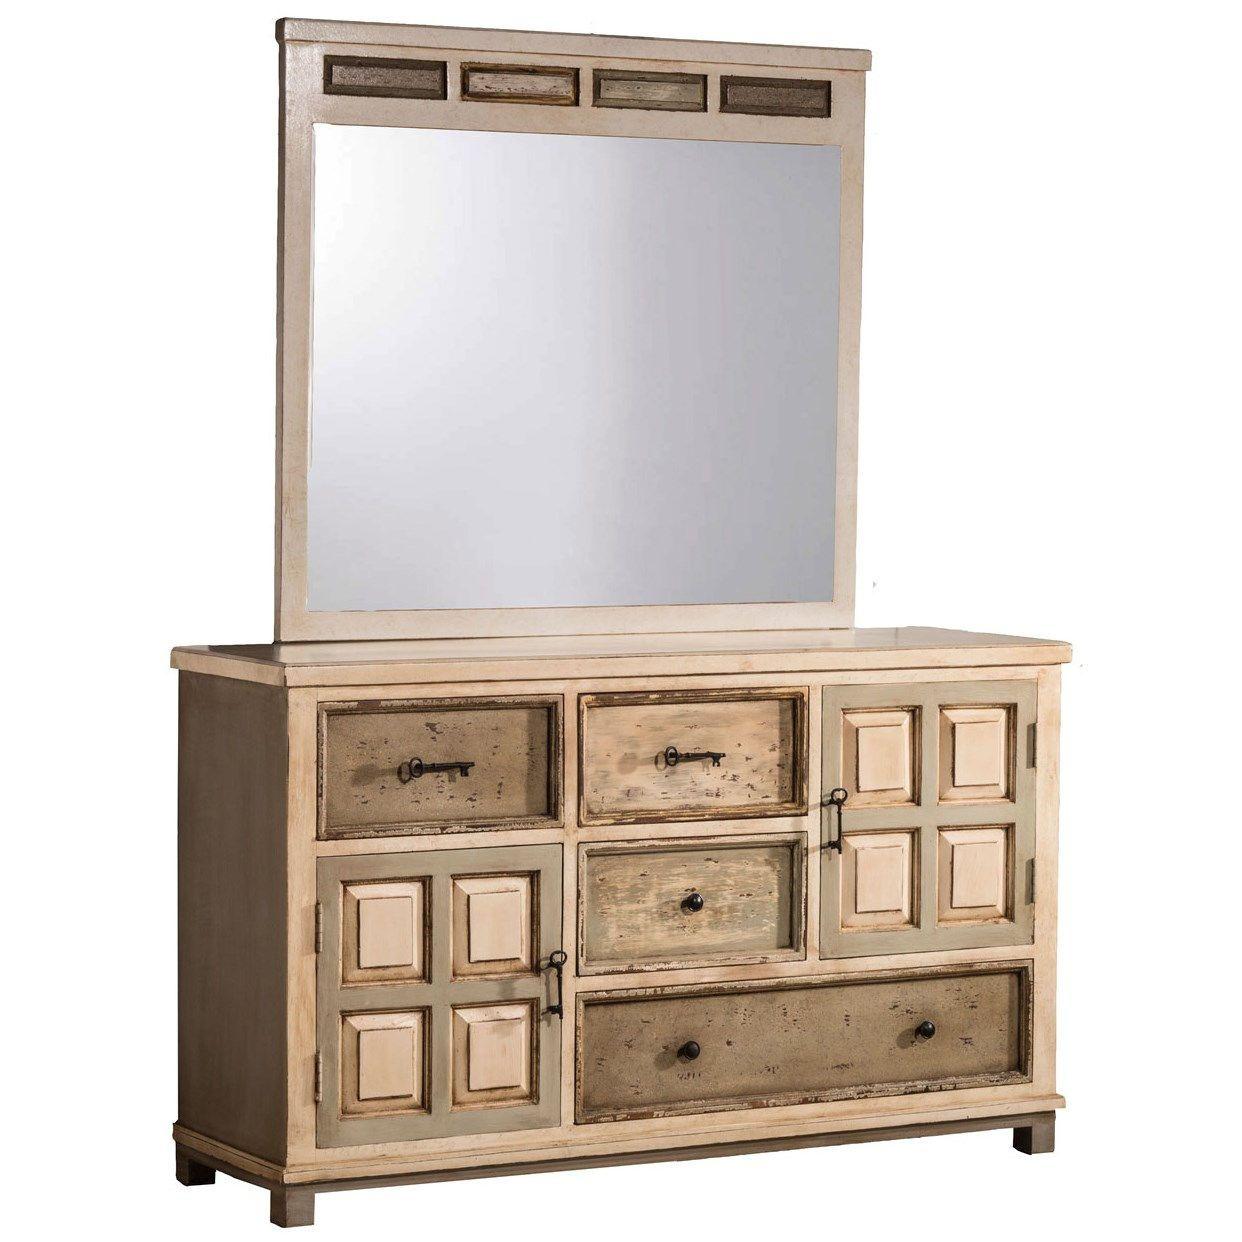 Hillsdale Furniture 1969DM LaRose Dresser And Mirror In